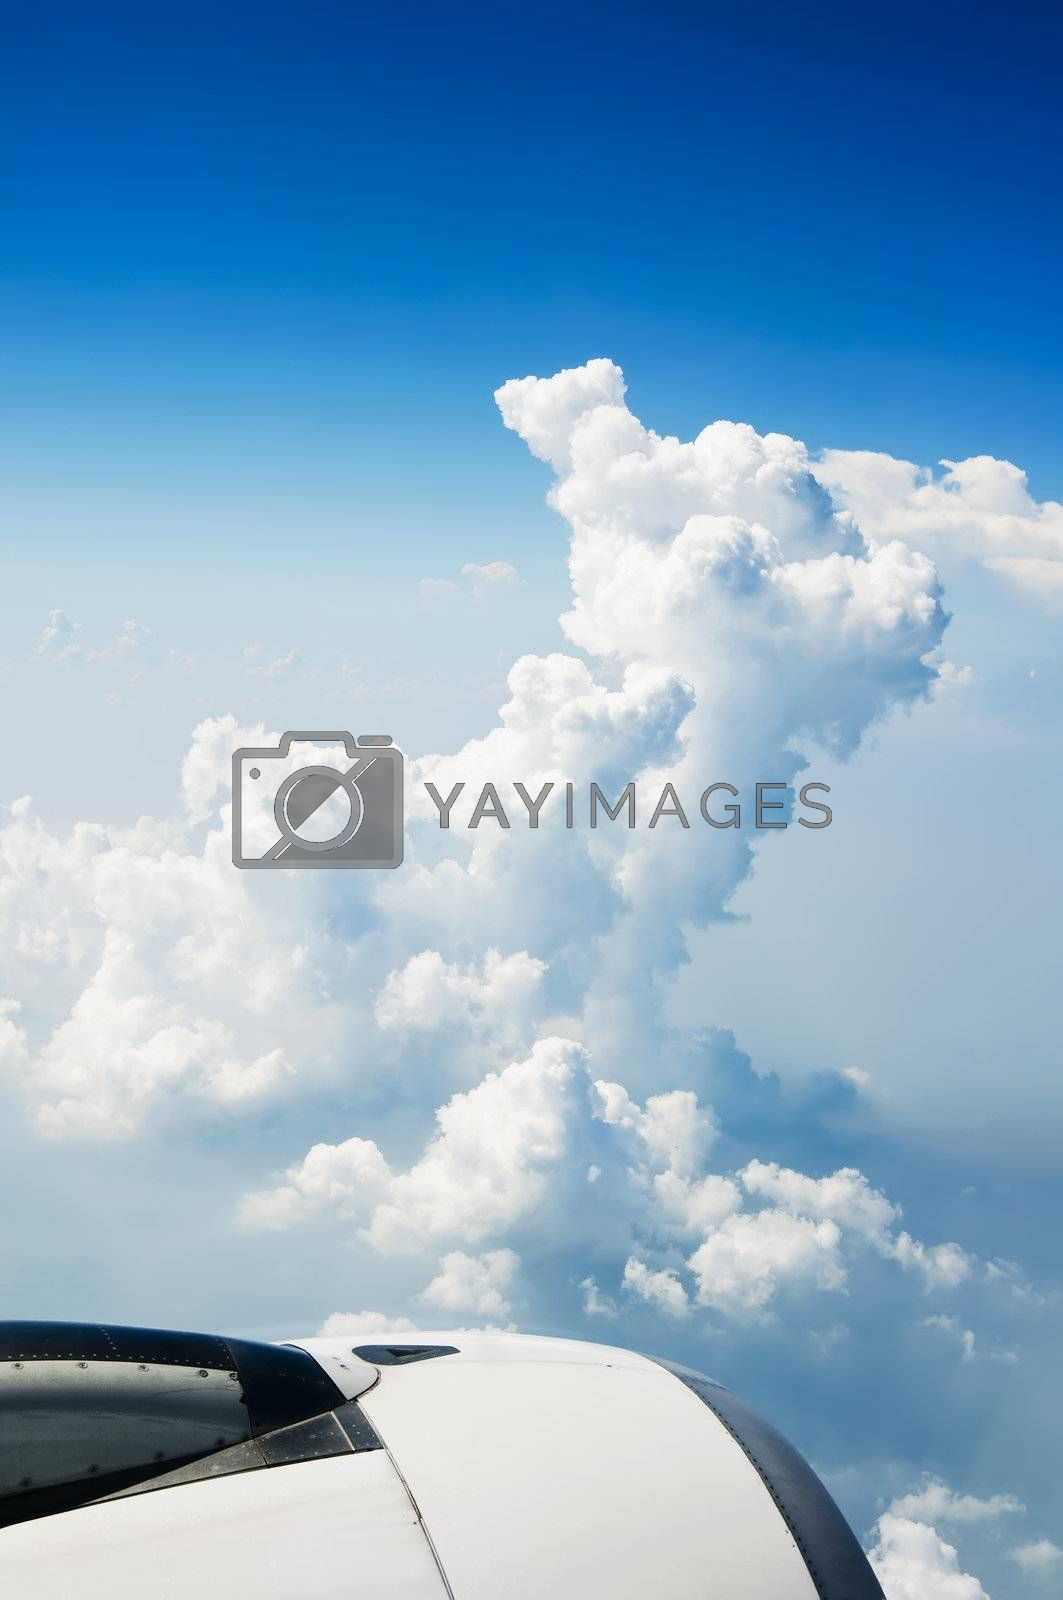 Royalty free image of Airplane by tonyoquias